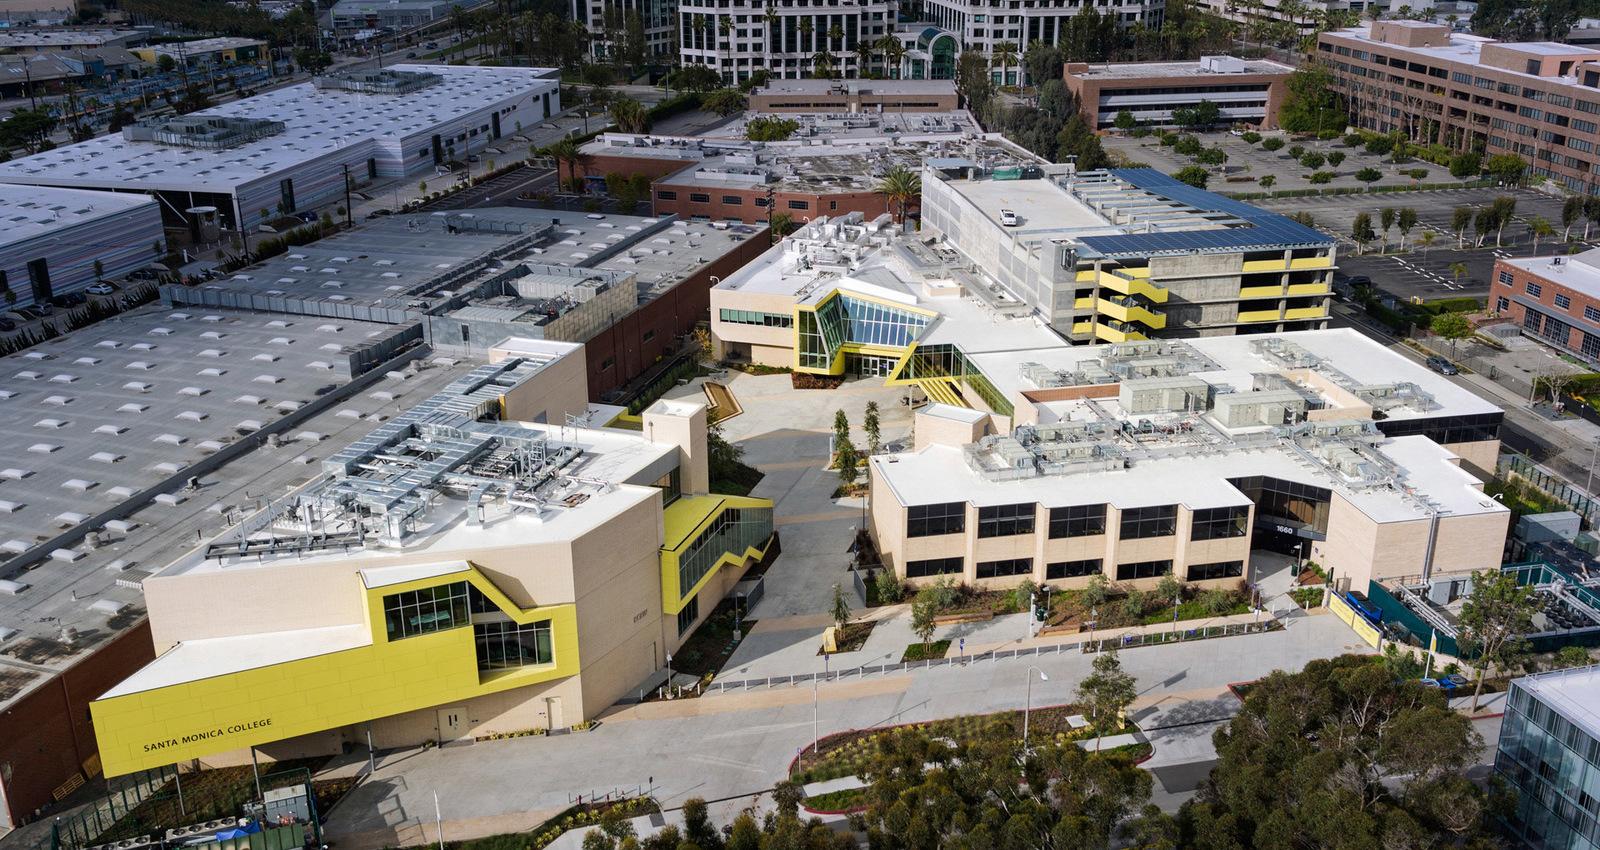 Santa Monica College Center for Media and Design & KCRW Media Center